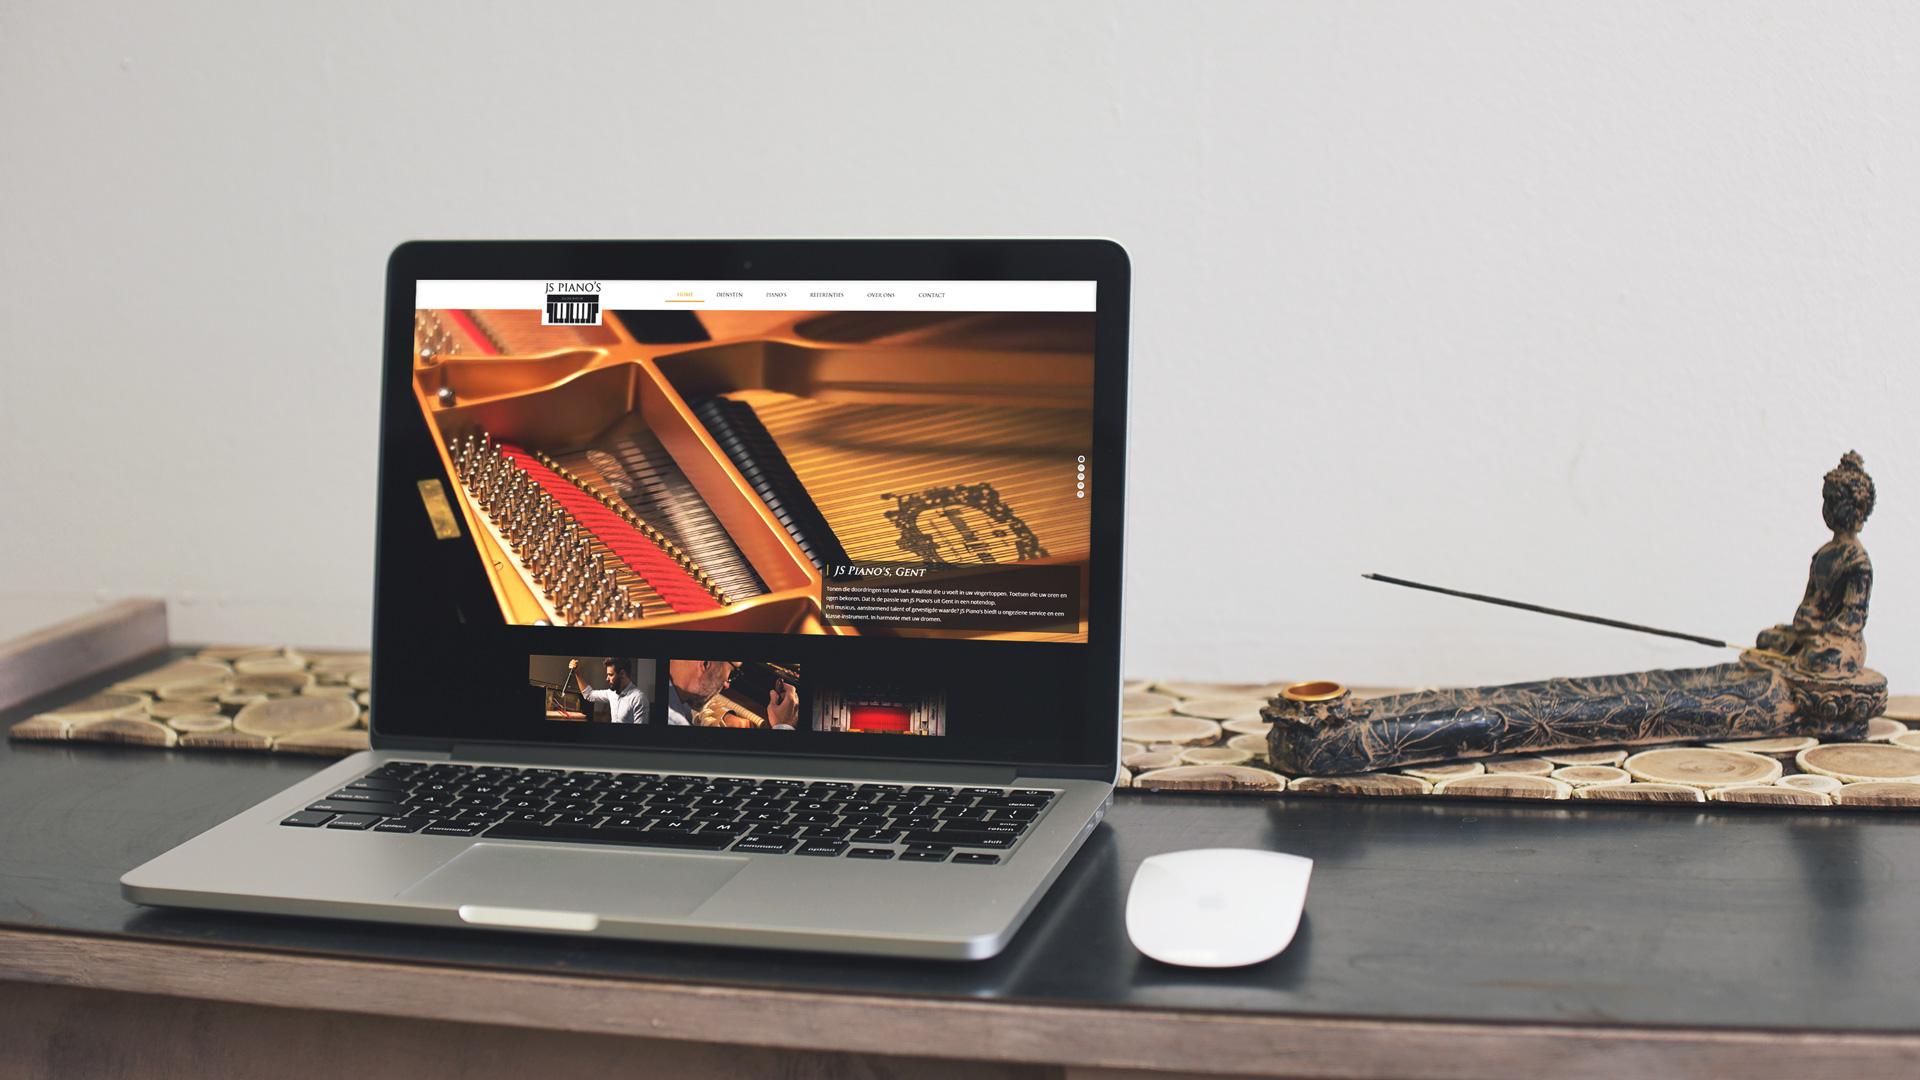 JS Piano's